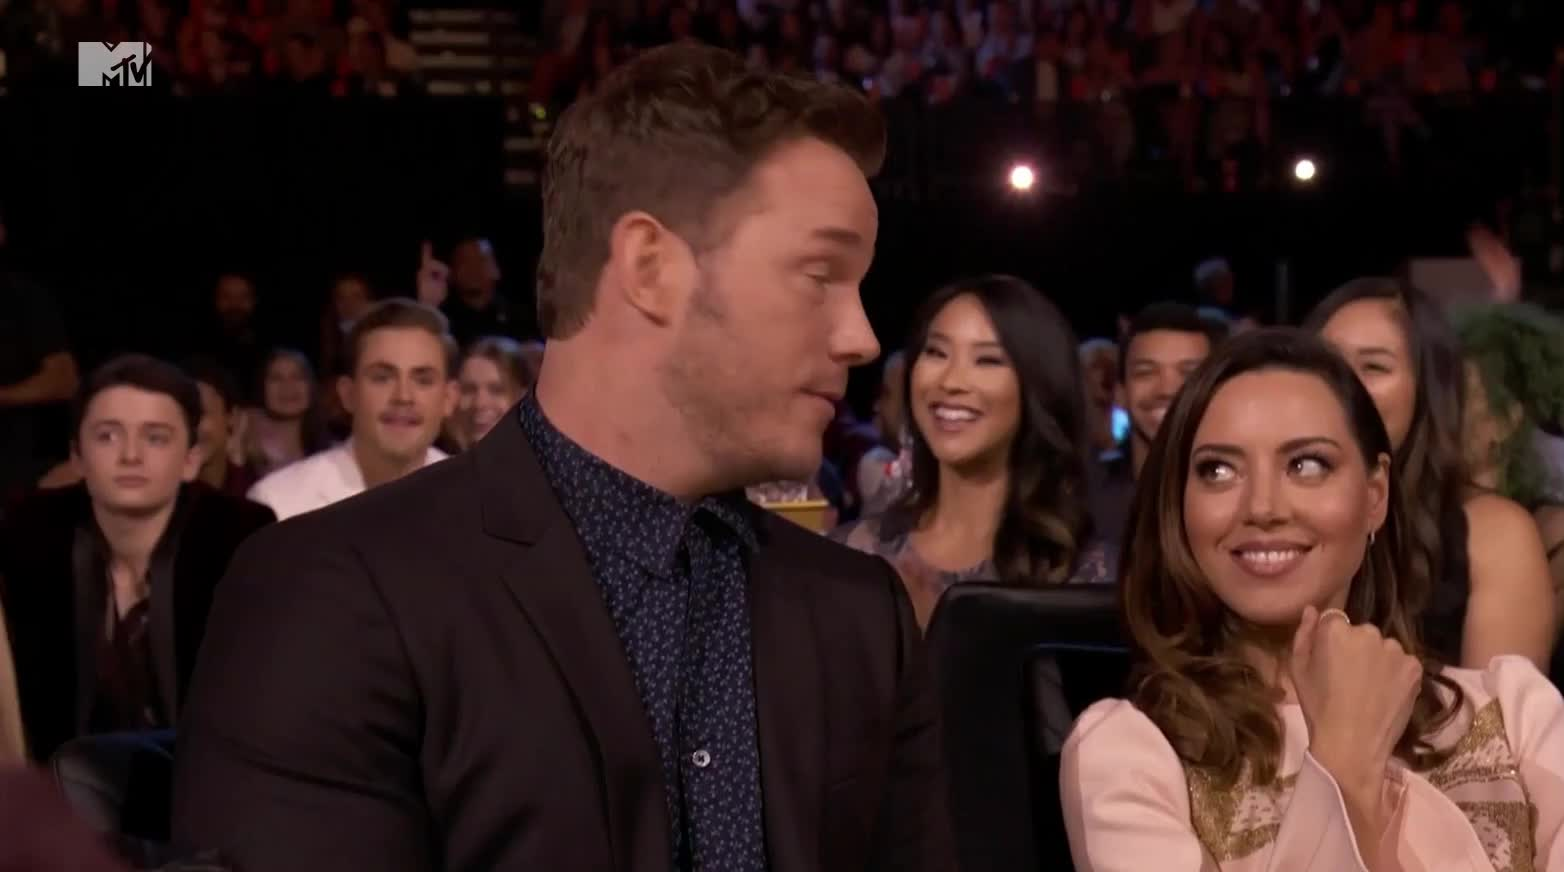 aubrey plaza, celebrity, celebs, chris pratt, mtv awards, Chris Pratt Aubrey Plaza MTV Movie Awards GIFs